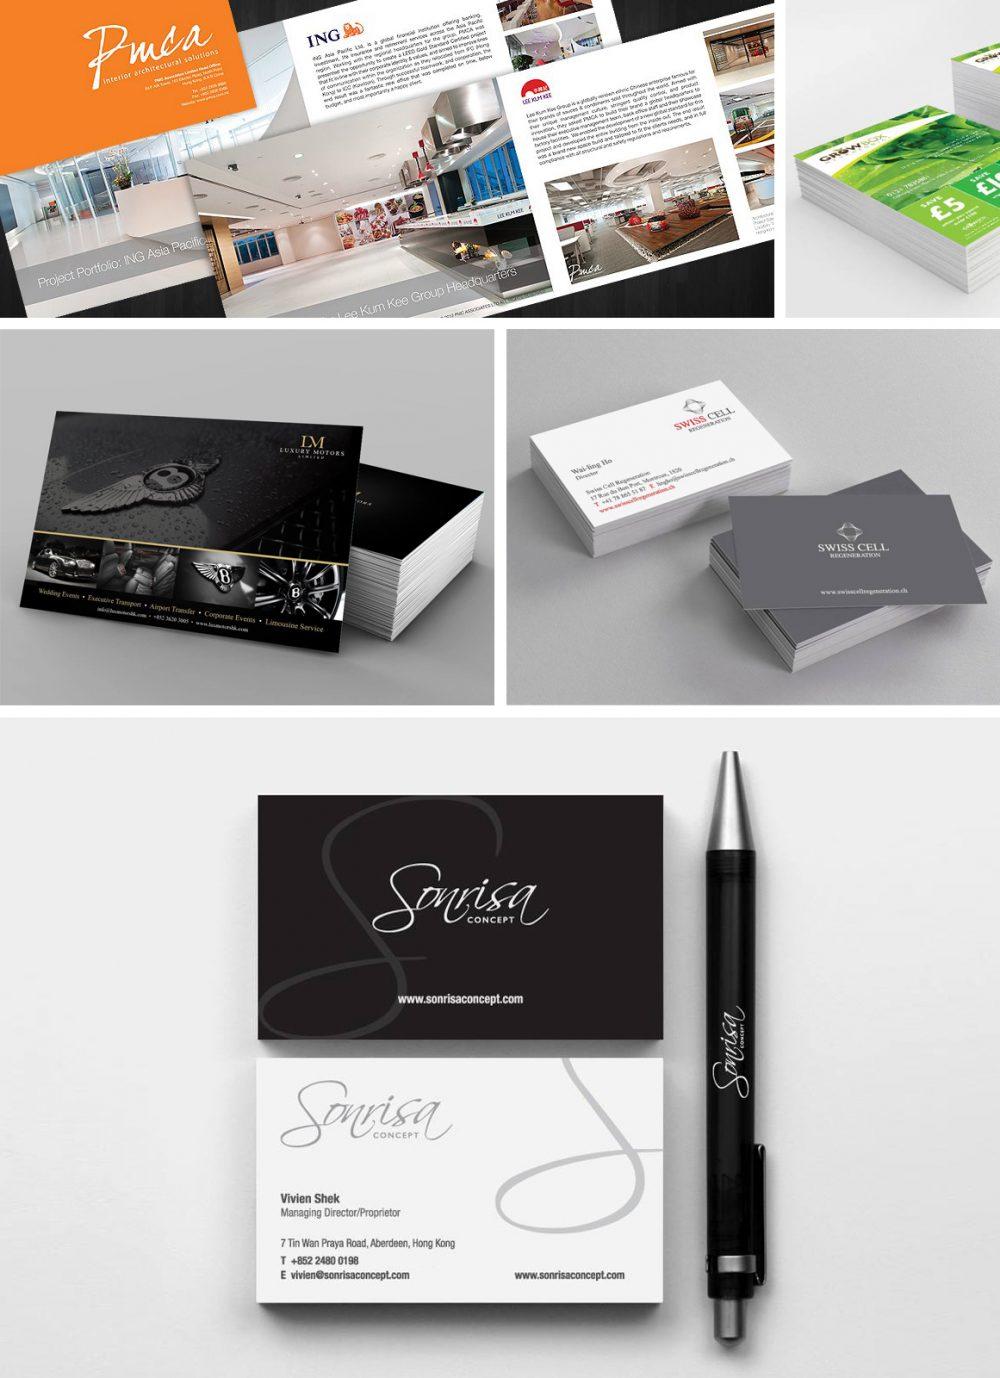 Fee Creative - graphic design